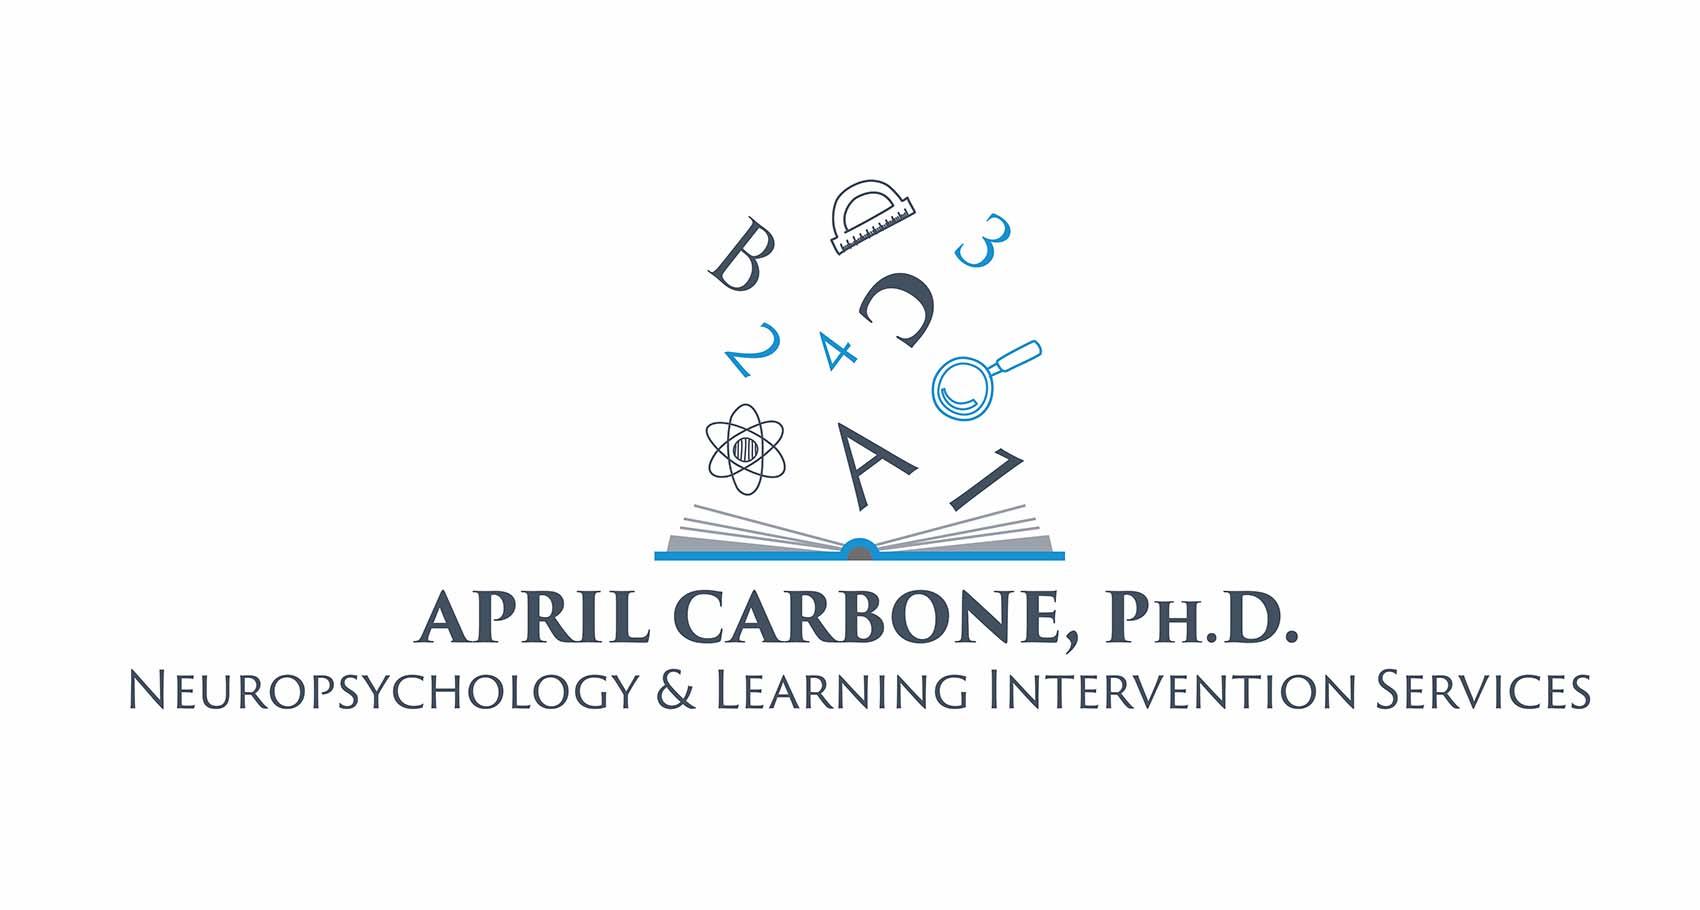 April Carbone, Ph.D. Logo